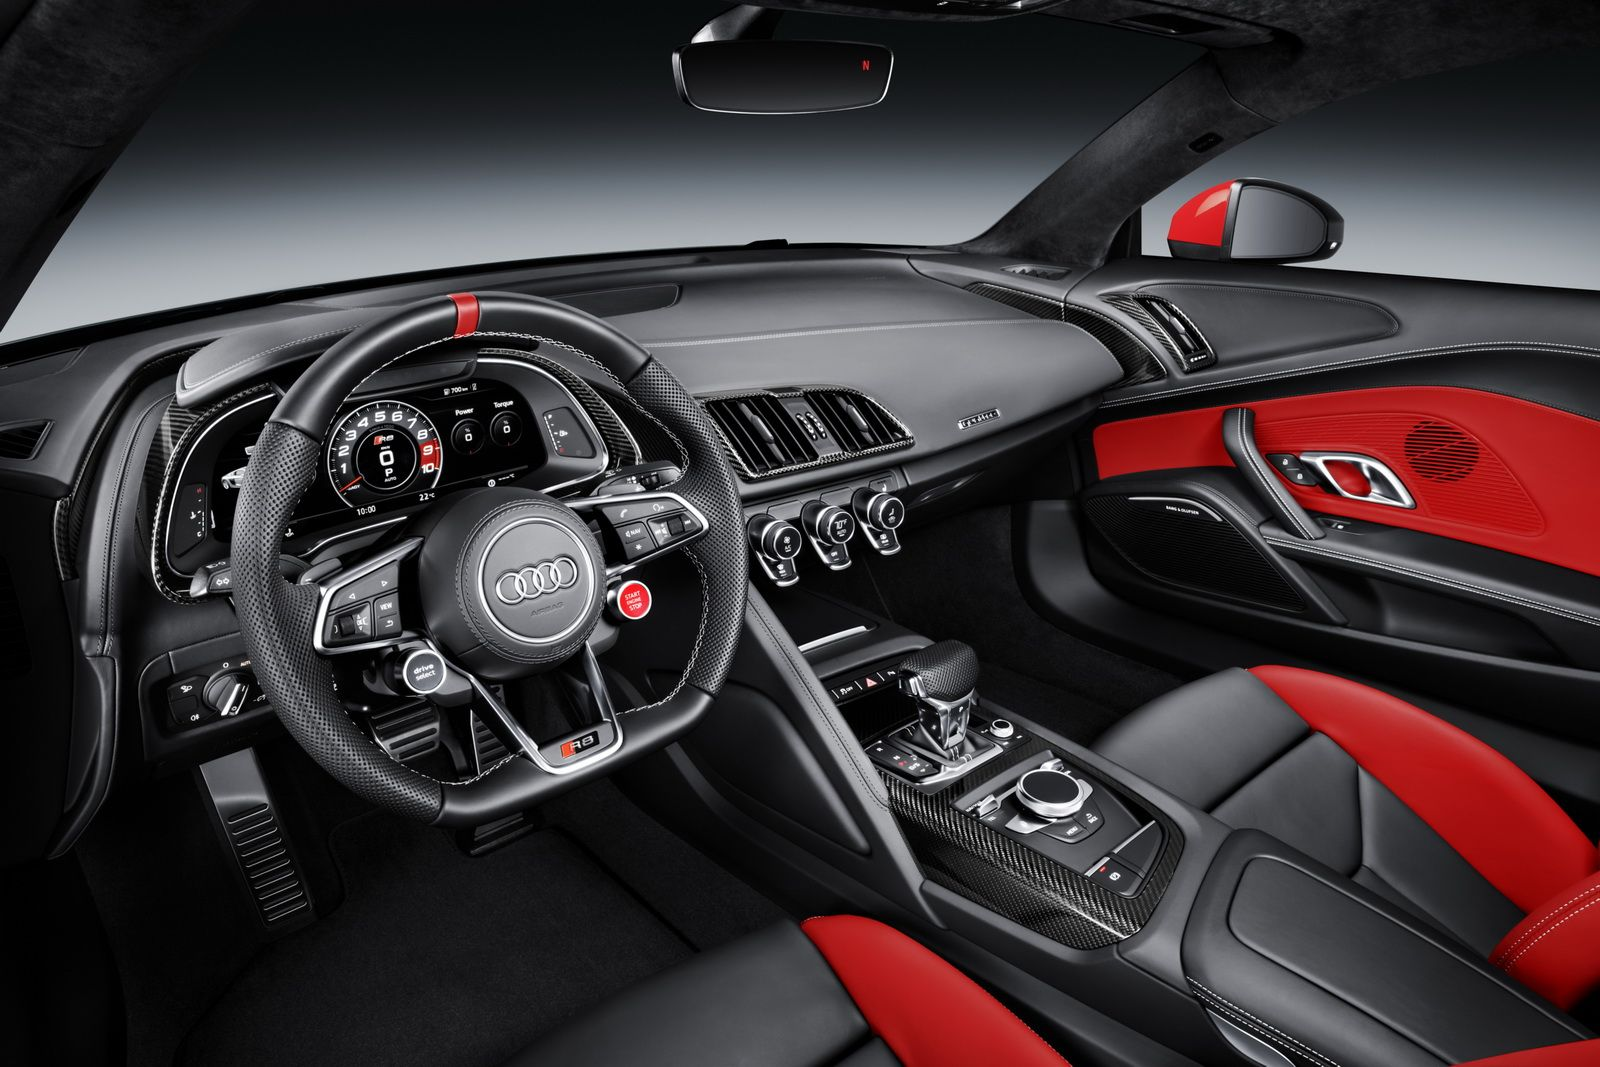 10 Audi R10 Price and Specs - 10 CARS RELEASE 10 | Audi ... | audi sports car price